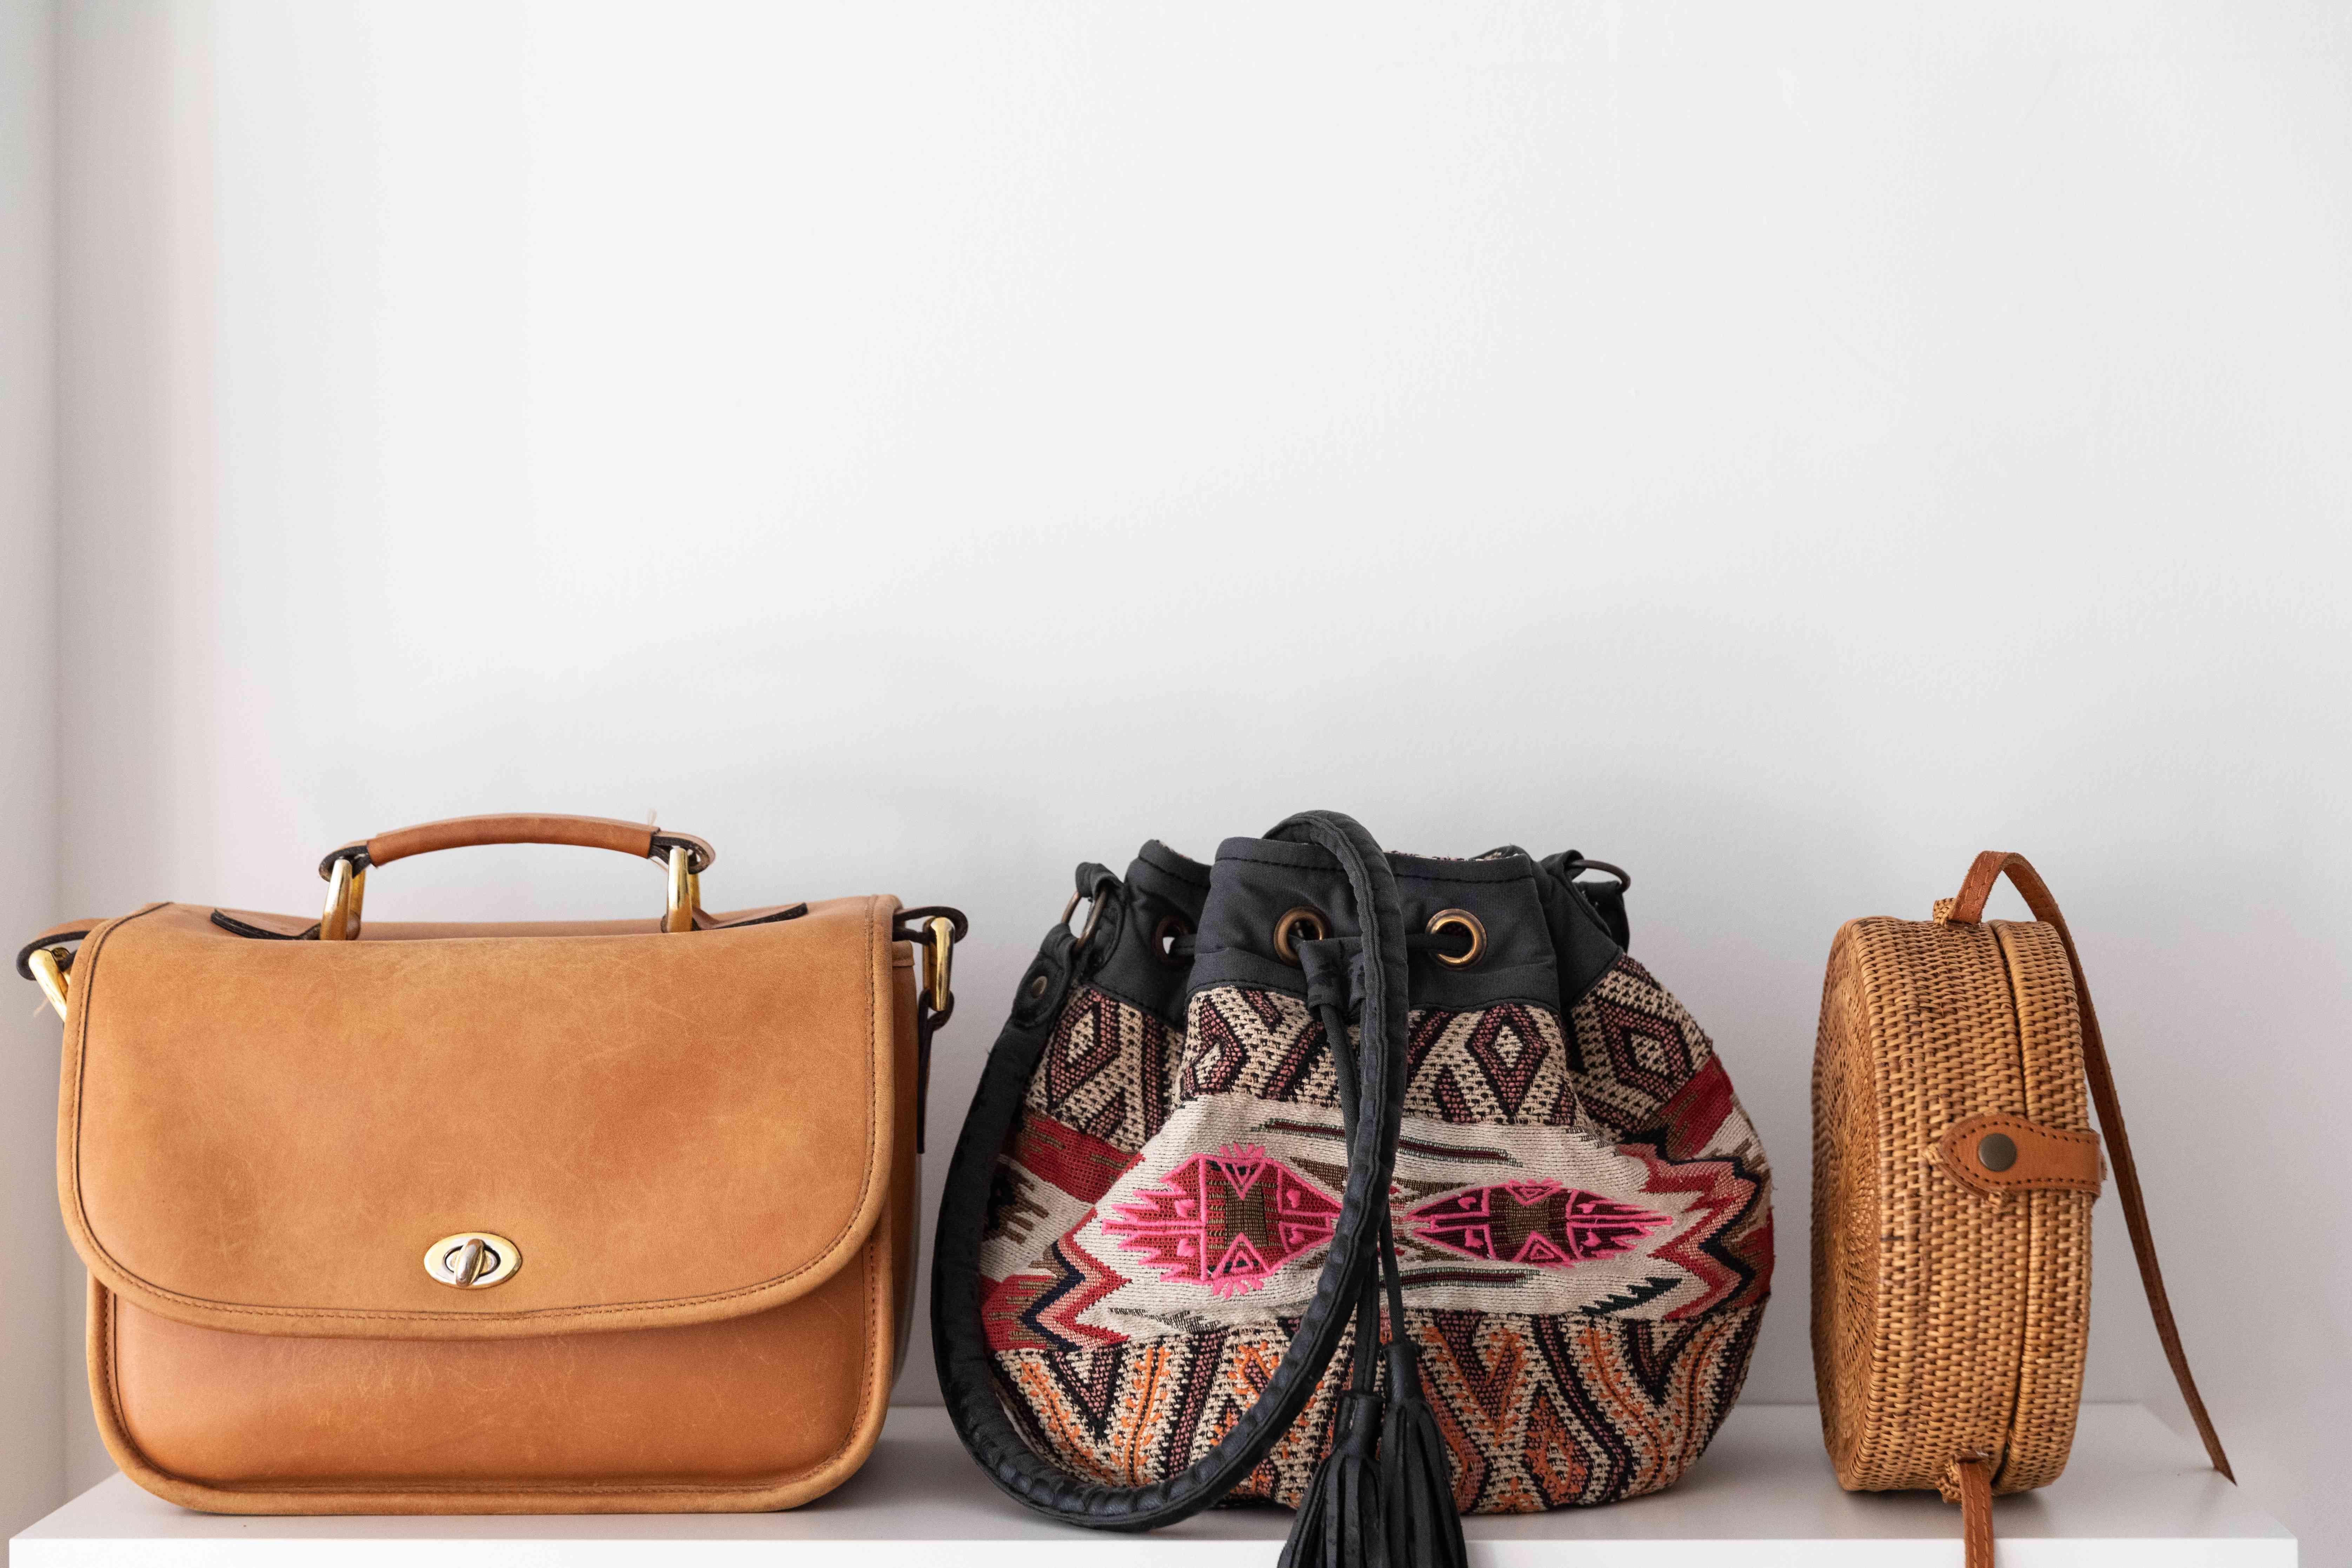 wall shelf holding handbags